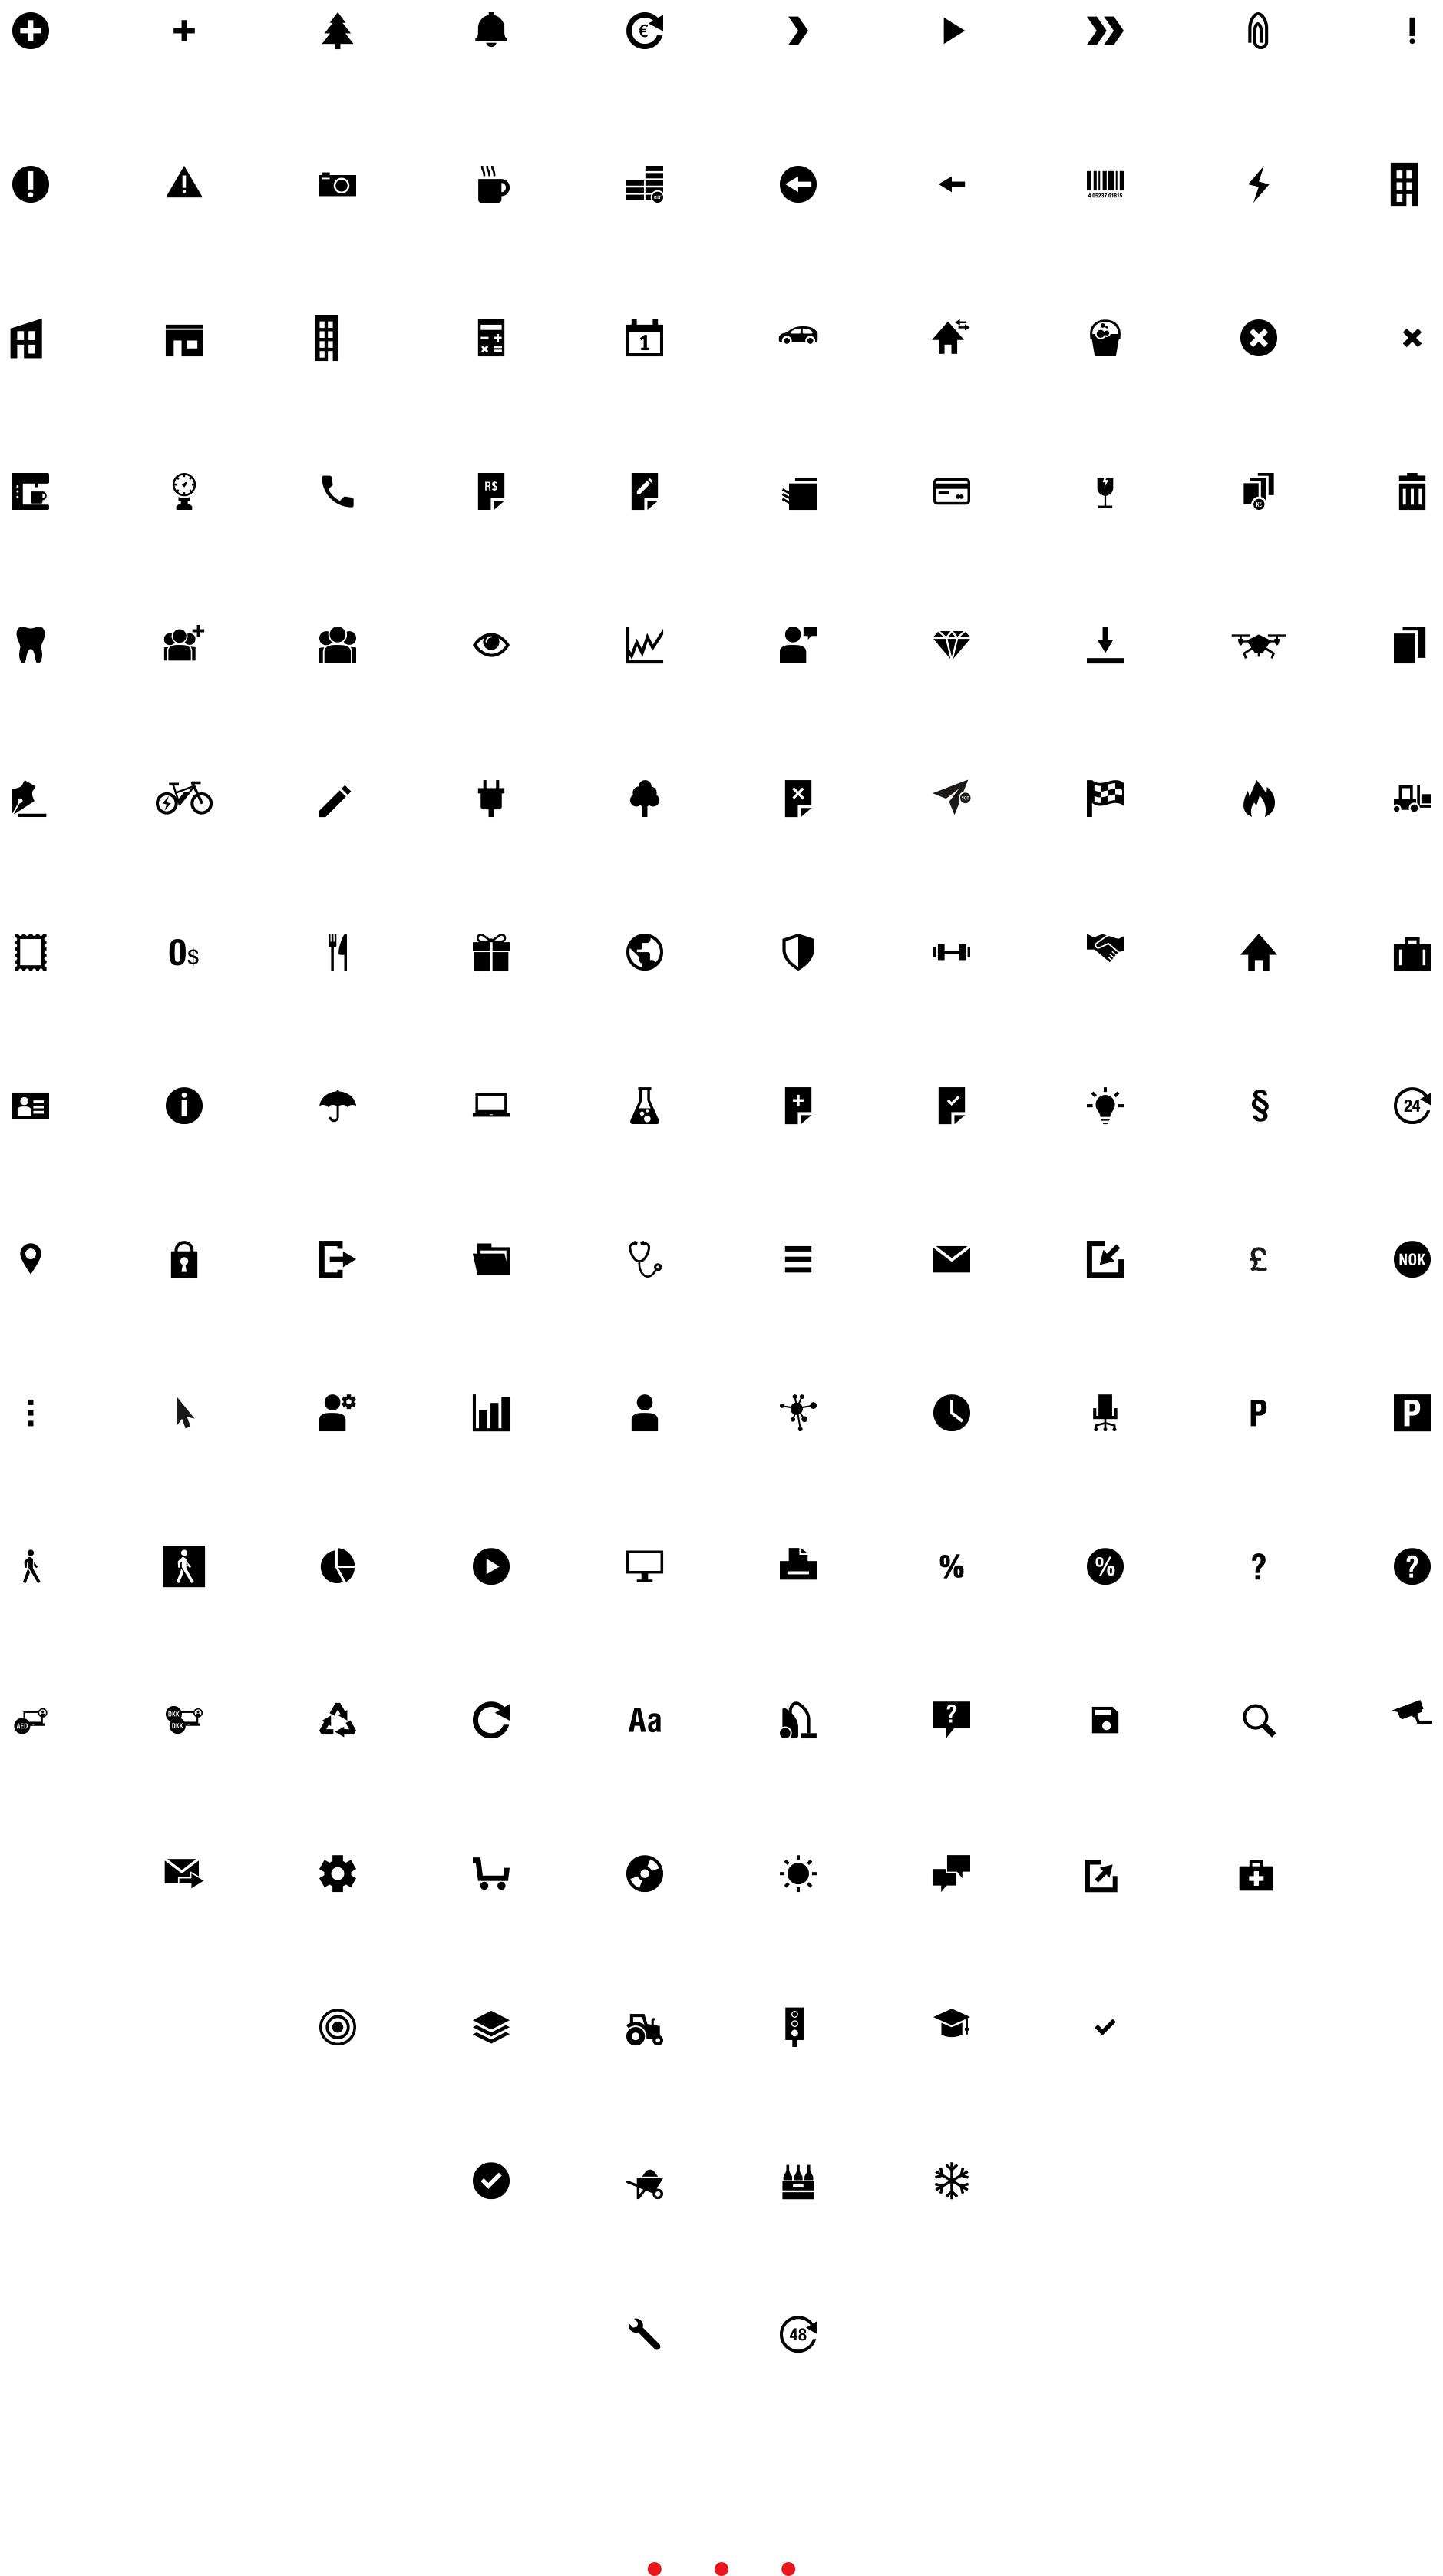 Grenke Piktogramme Iconset Übersicht Bourdonné Design